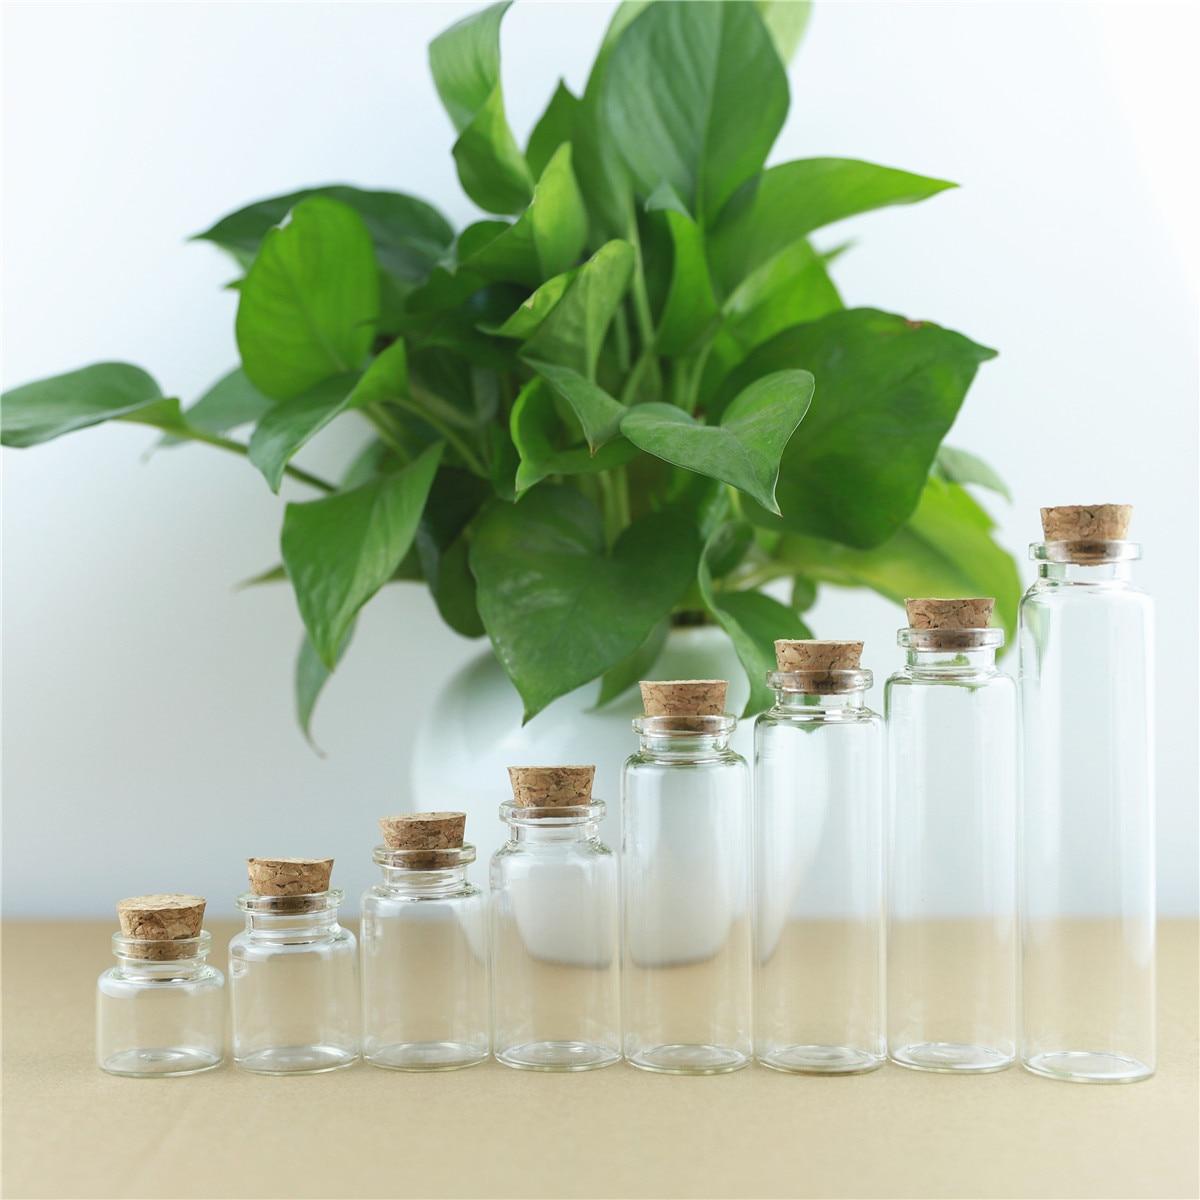 50pcs/lot 30mm 10-60ml Cork Glass Bottles Borosilicate Heat-resistant Wishing Bottle Glass Jars Travel Storage Wedding Container